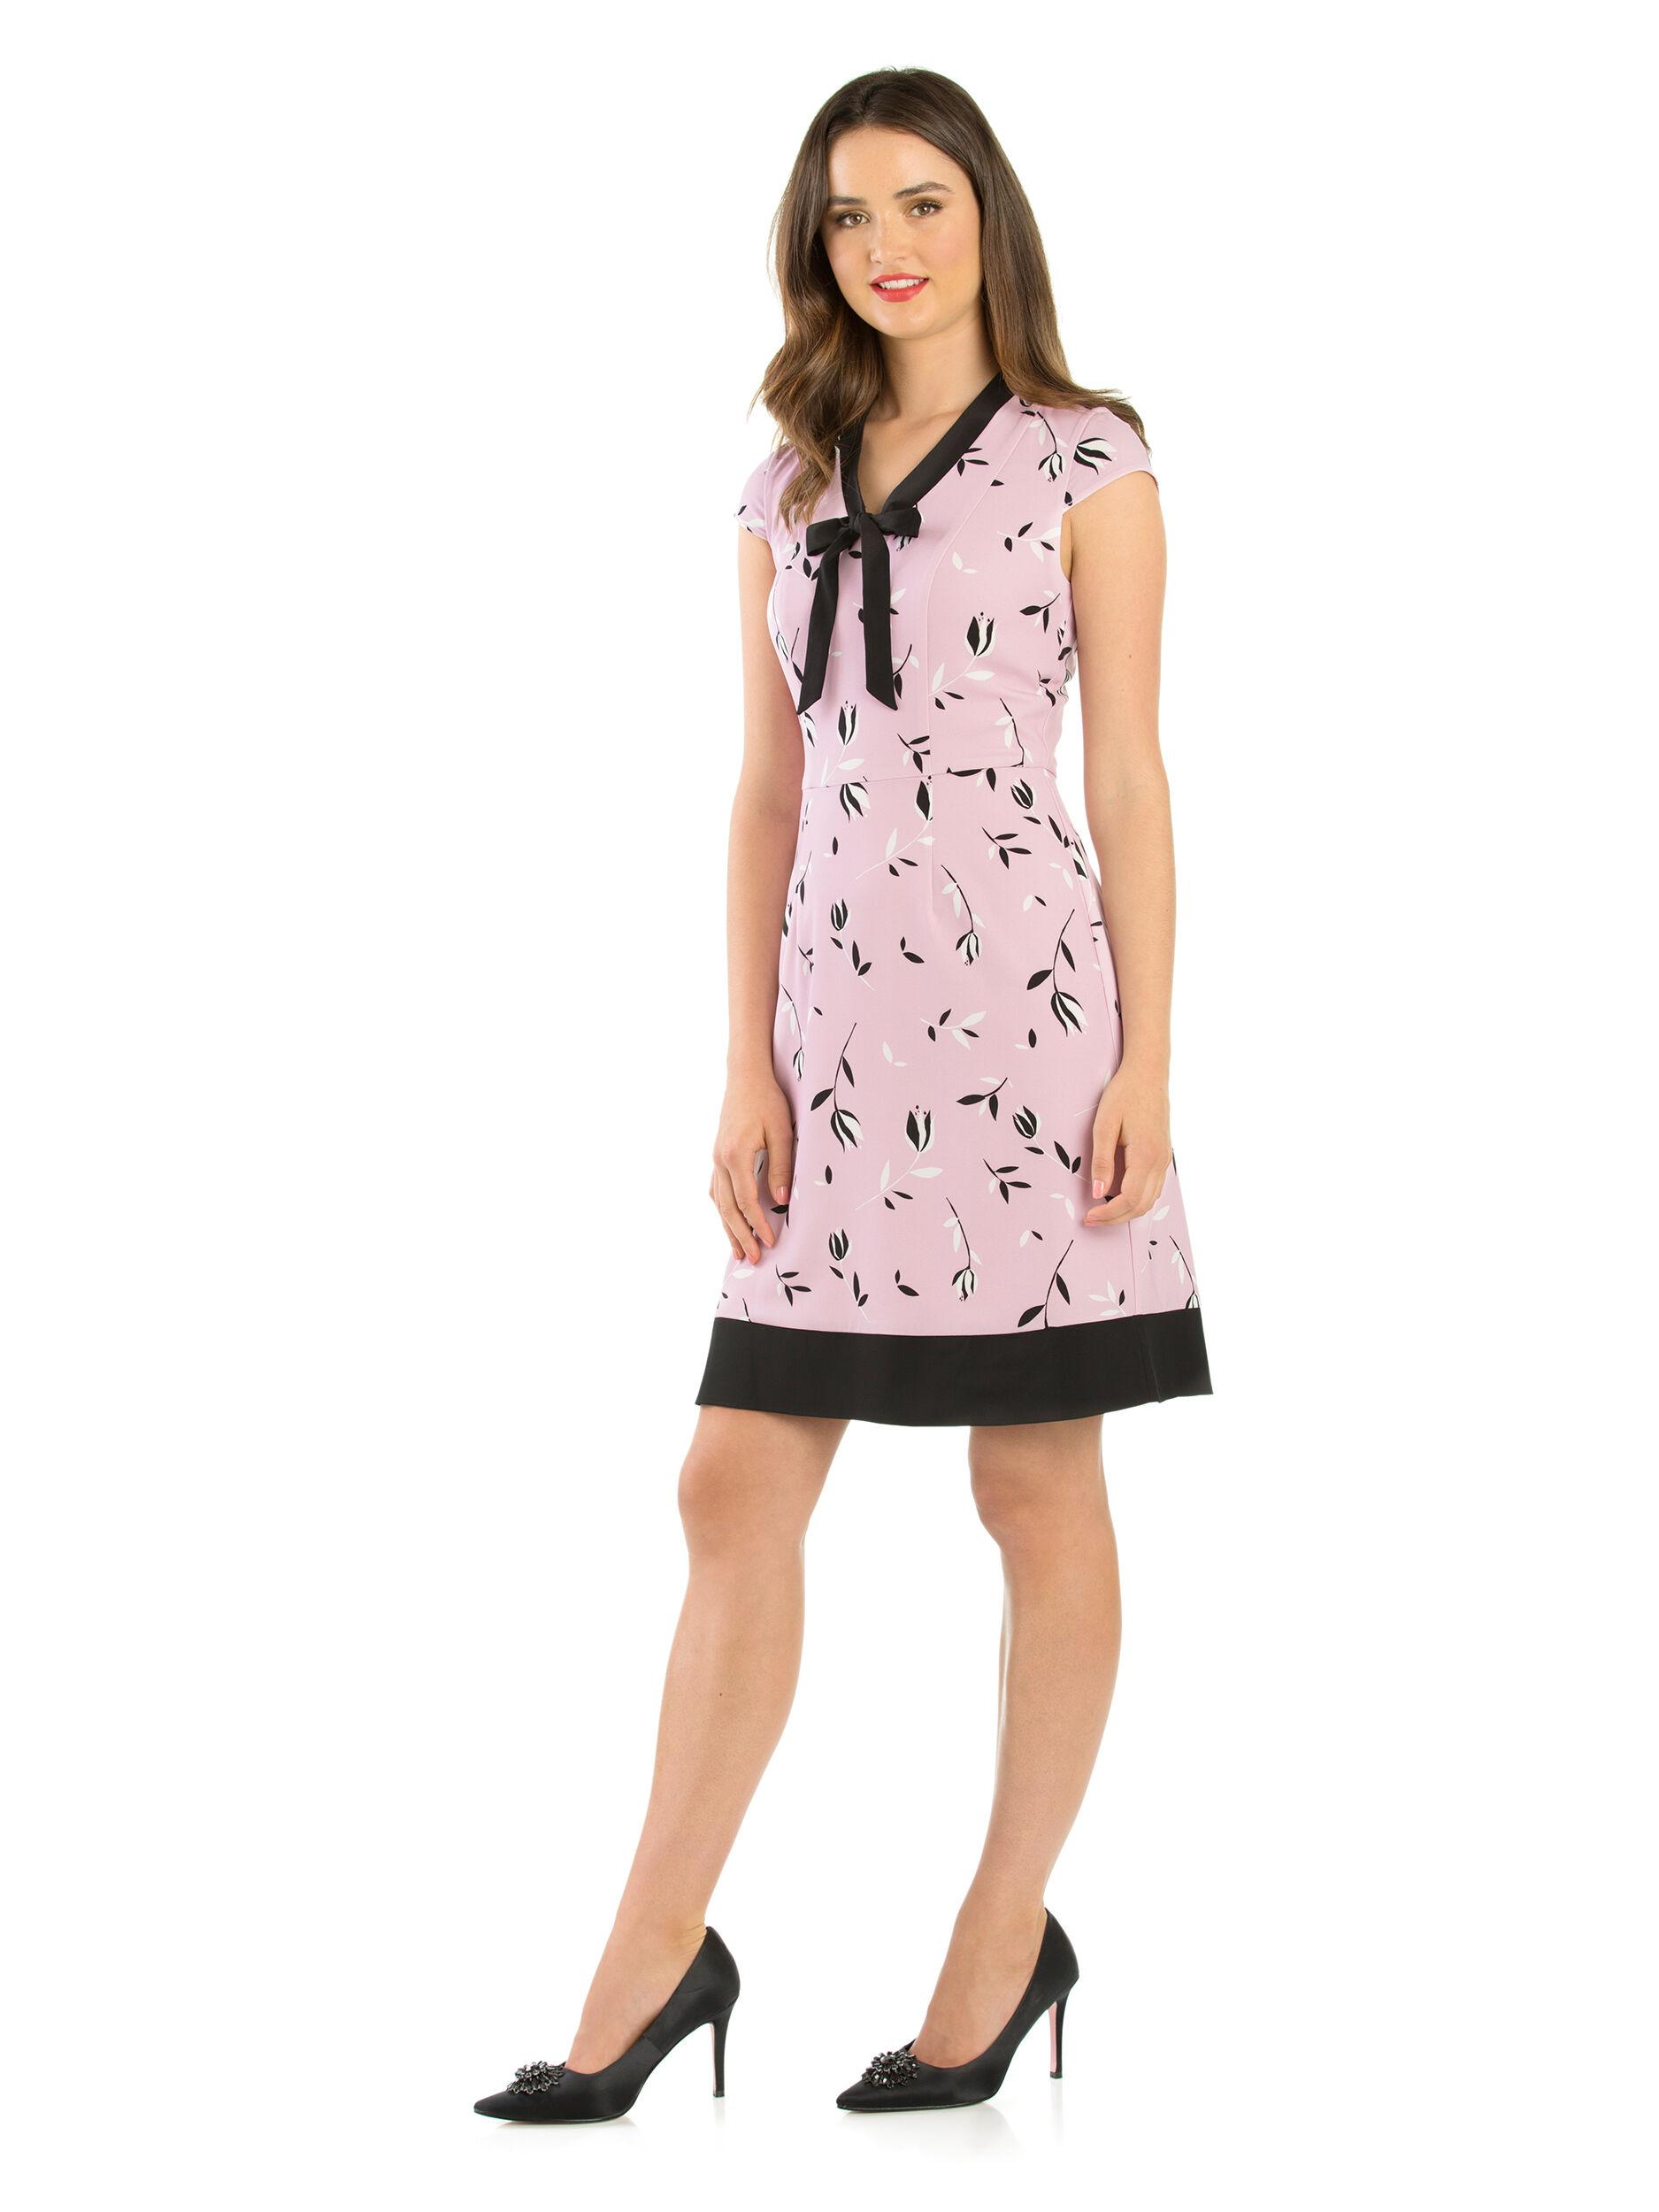 My Sweetheart Dress